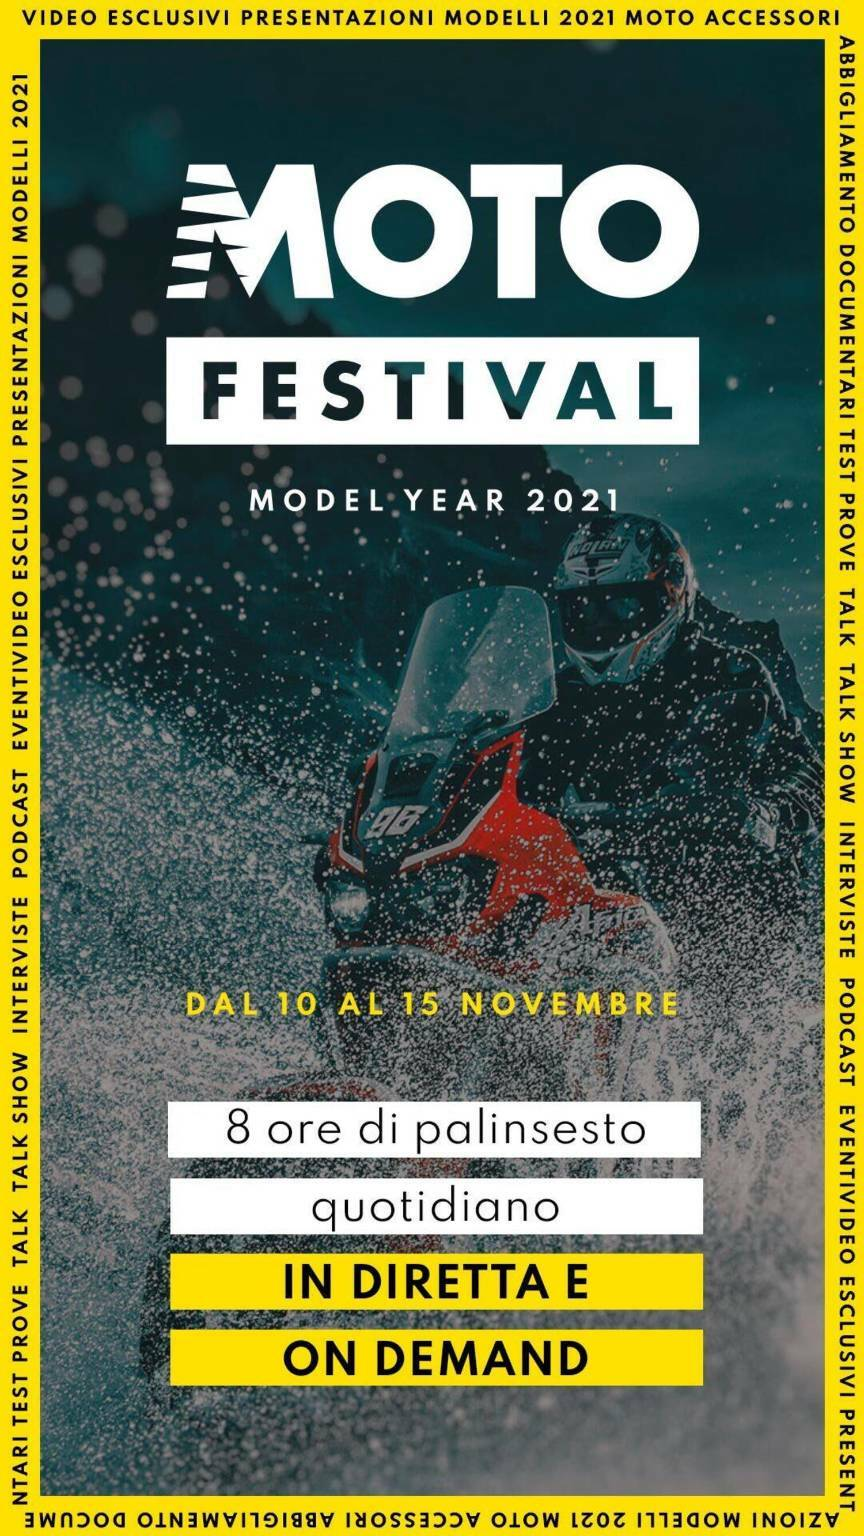 Motofestival